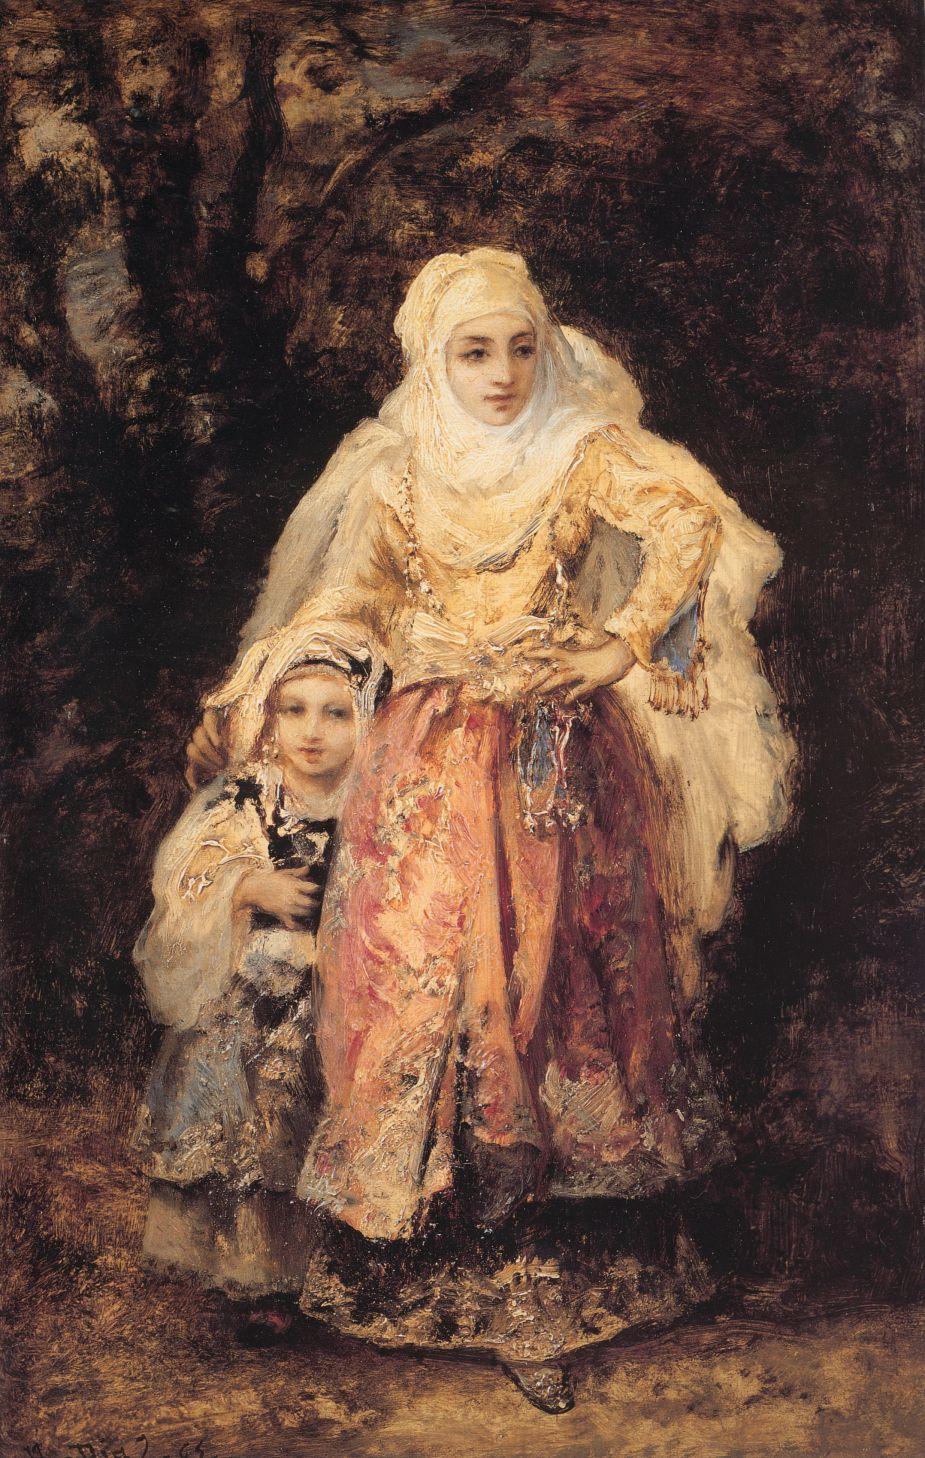 Oriental Woman and Her Daughter by Narcisse Virgile Diaz de la Pena